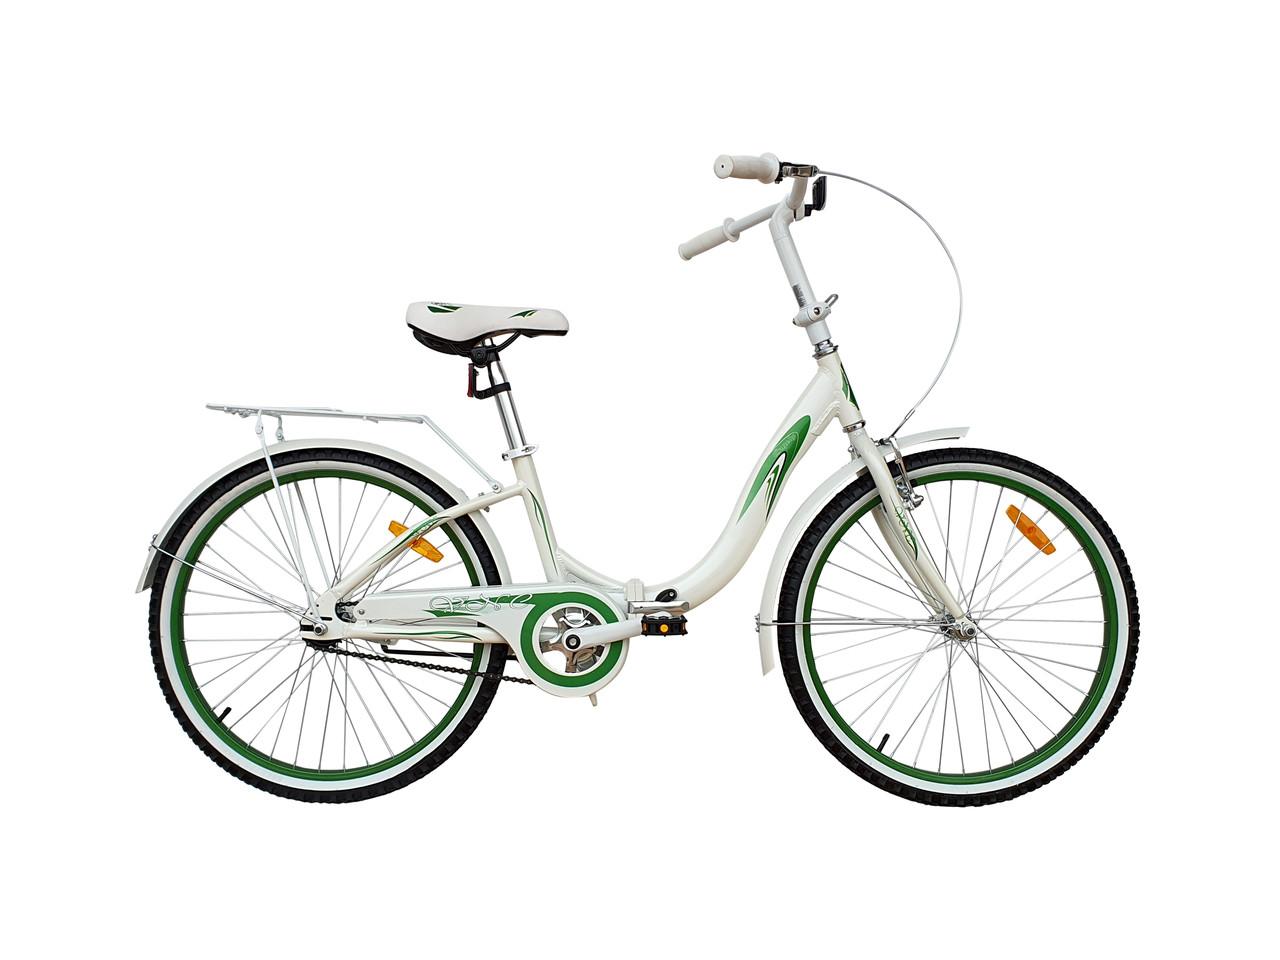 "Велосипед VNC Angely 24'' Folding, 24AN-30-WG, складной белый / зеленый 12"""